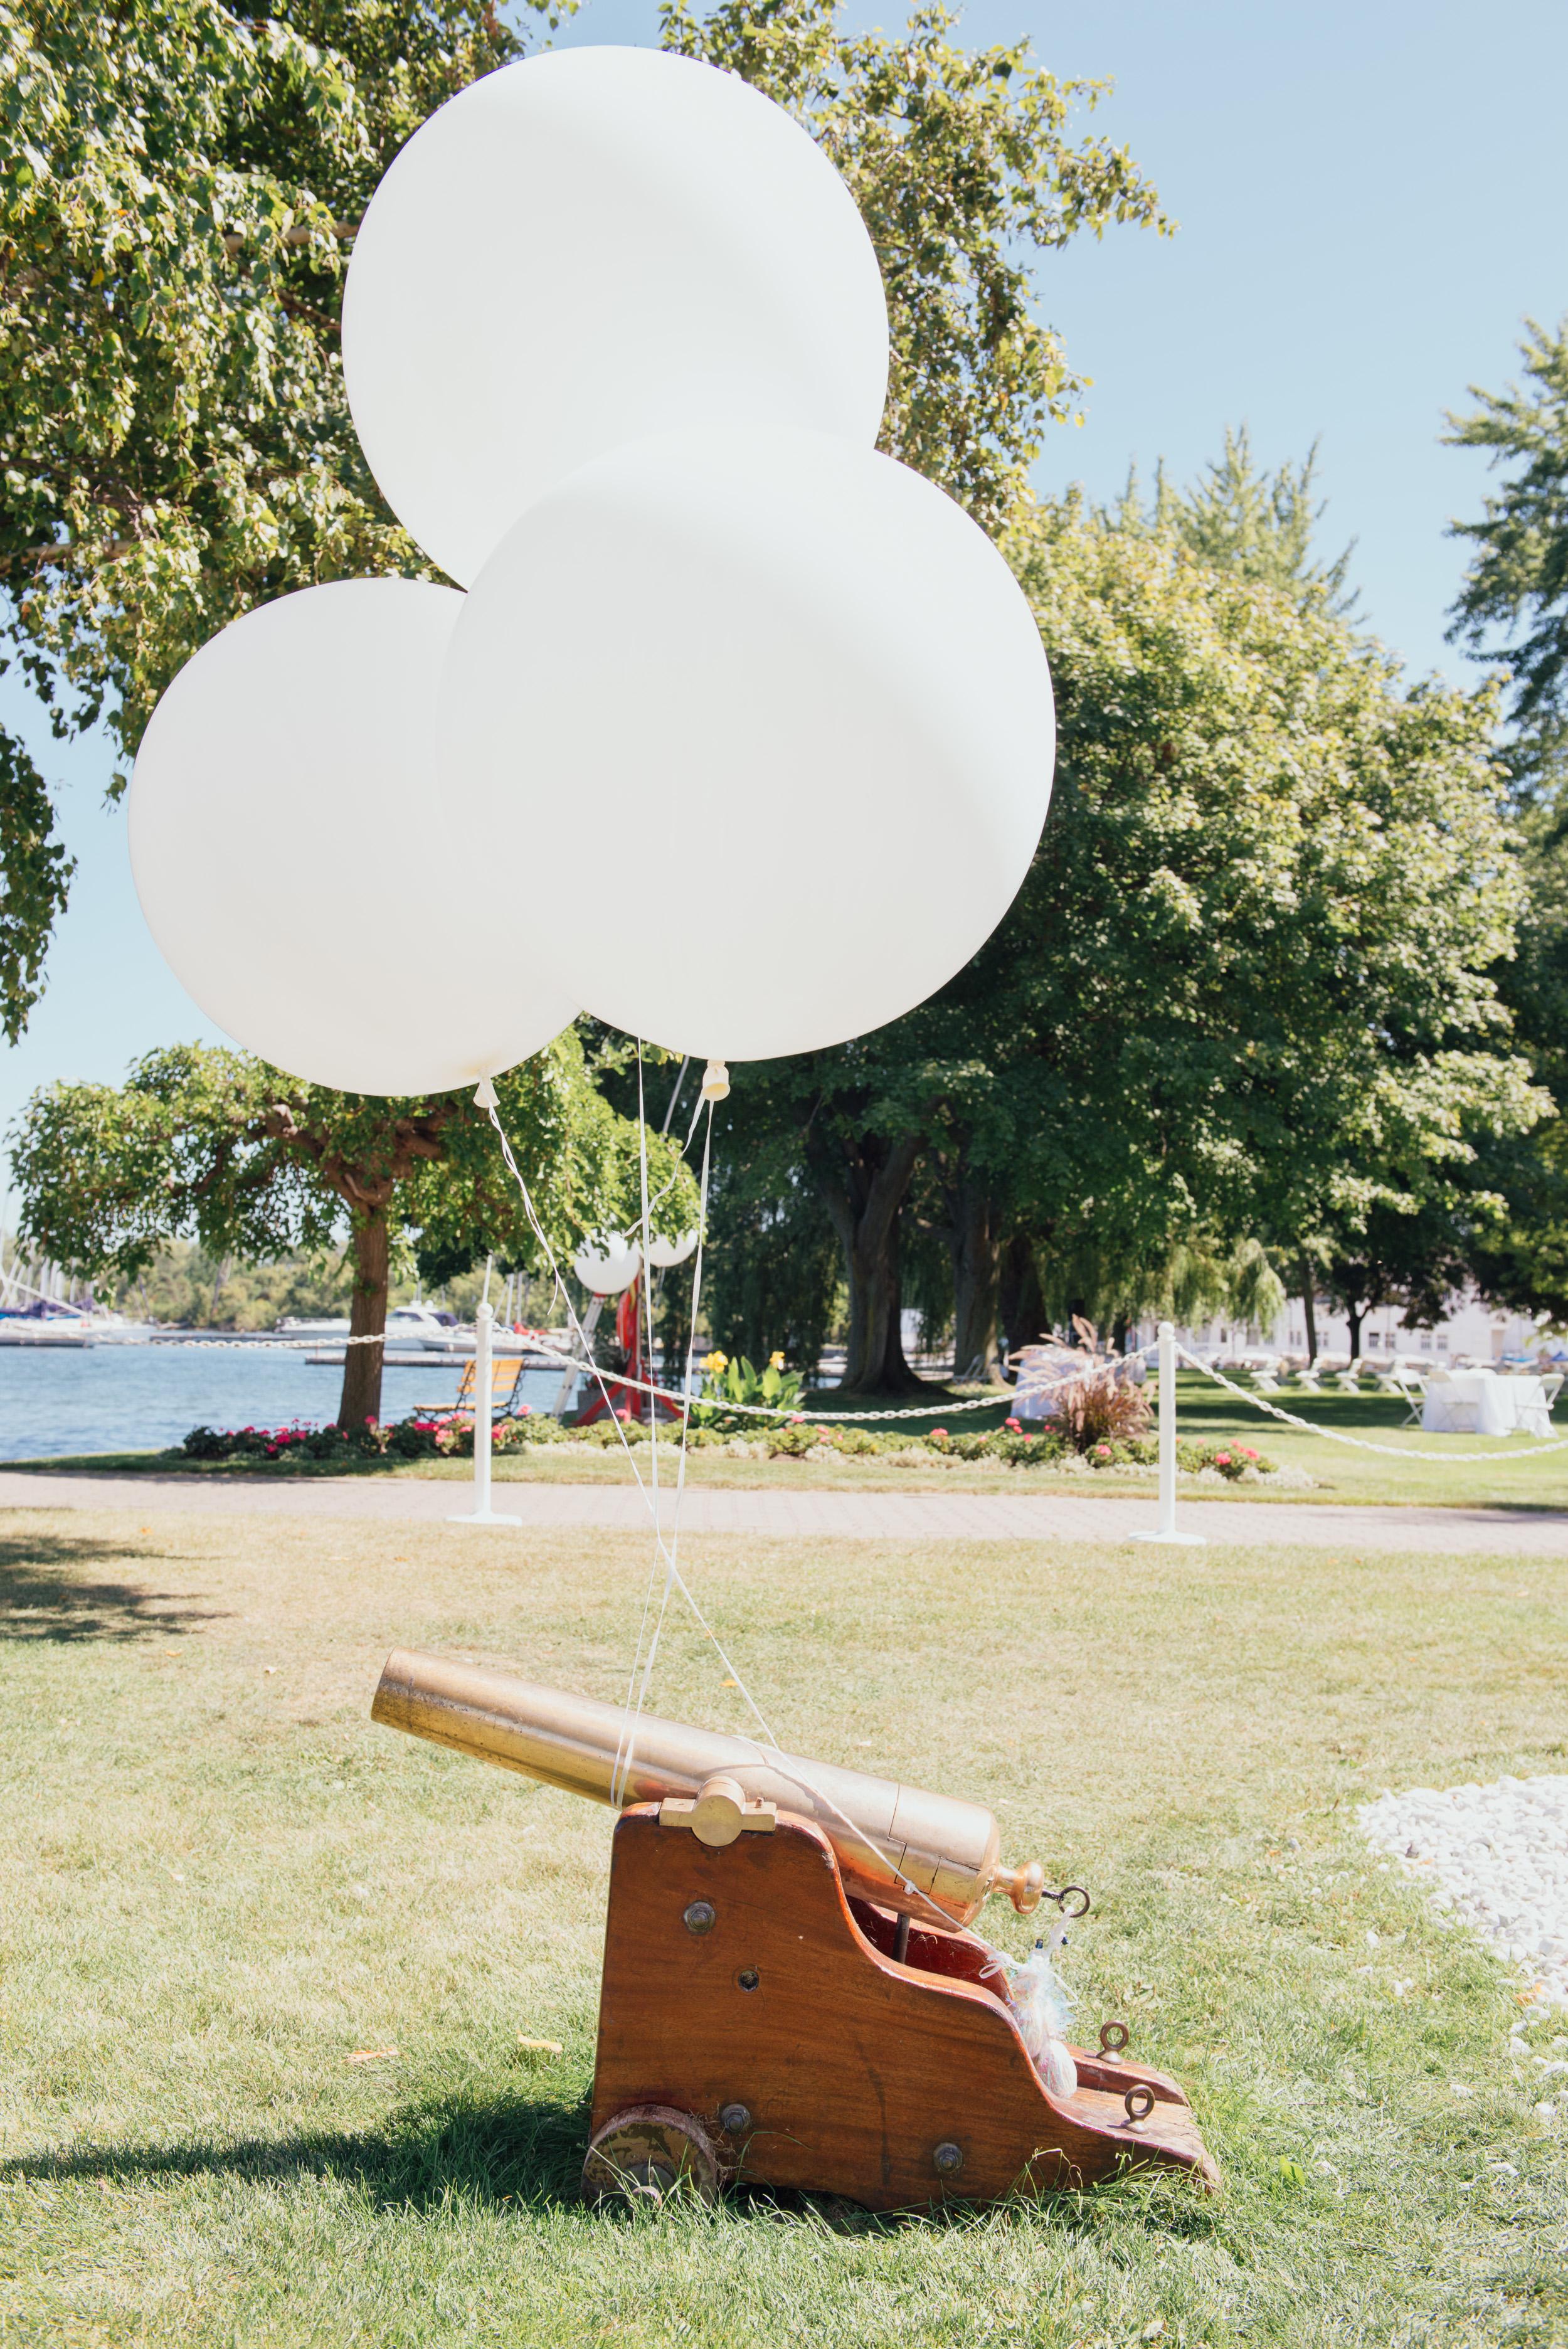 cleland-studios-wedding-photography-46.jpg